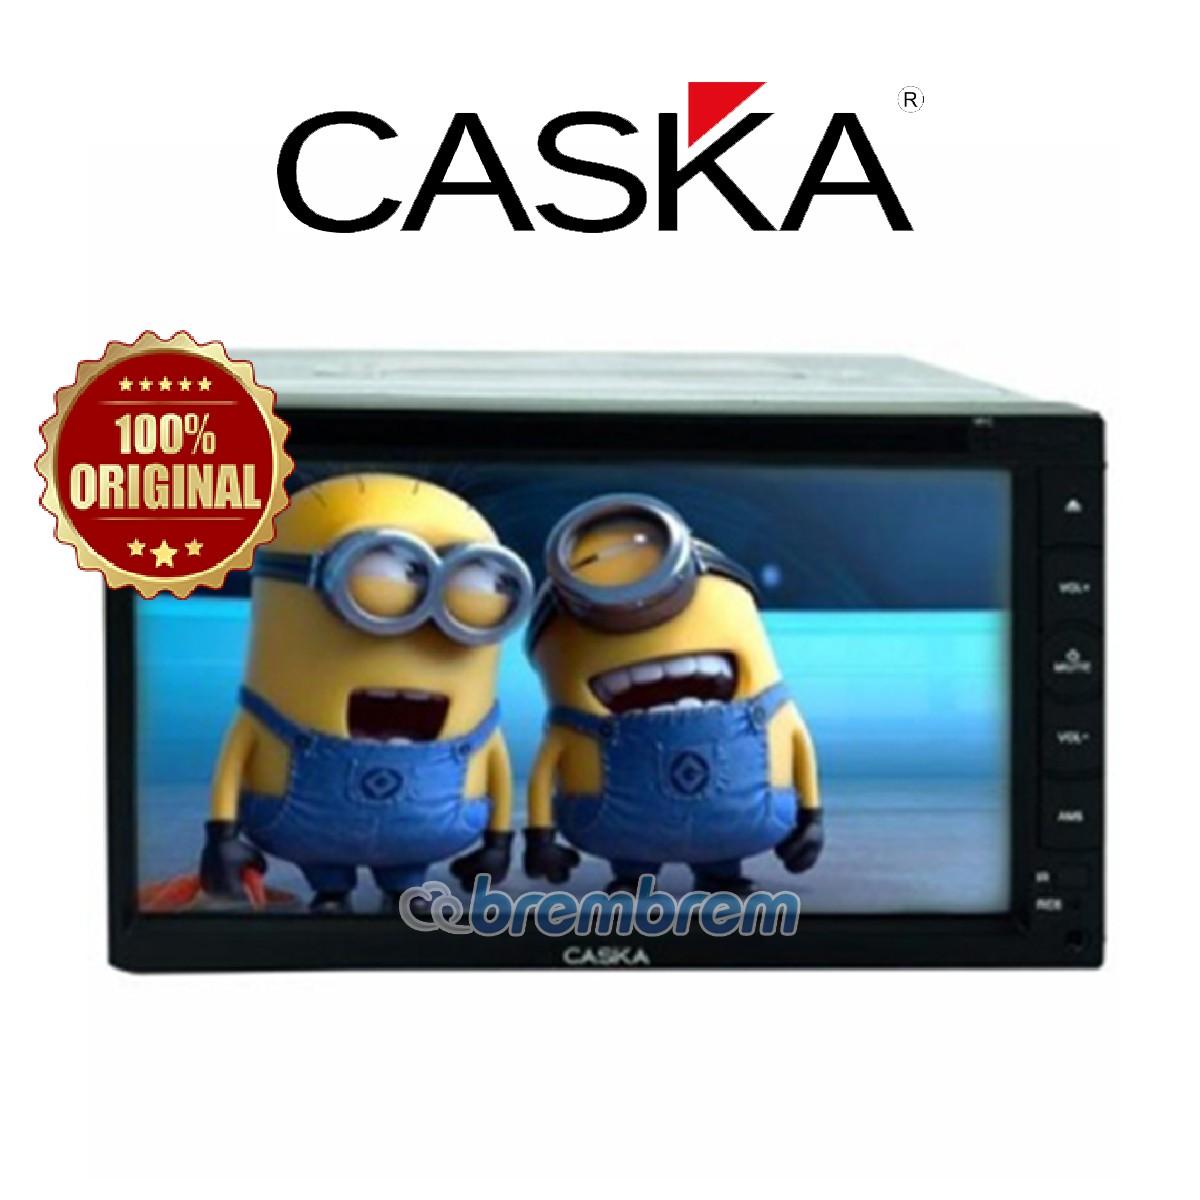 CASKA CA1620 FIT SERIES - HEADUNIT DOUBLE DIN